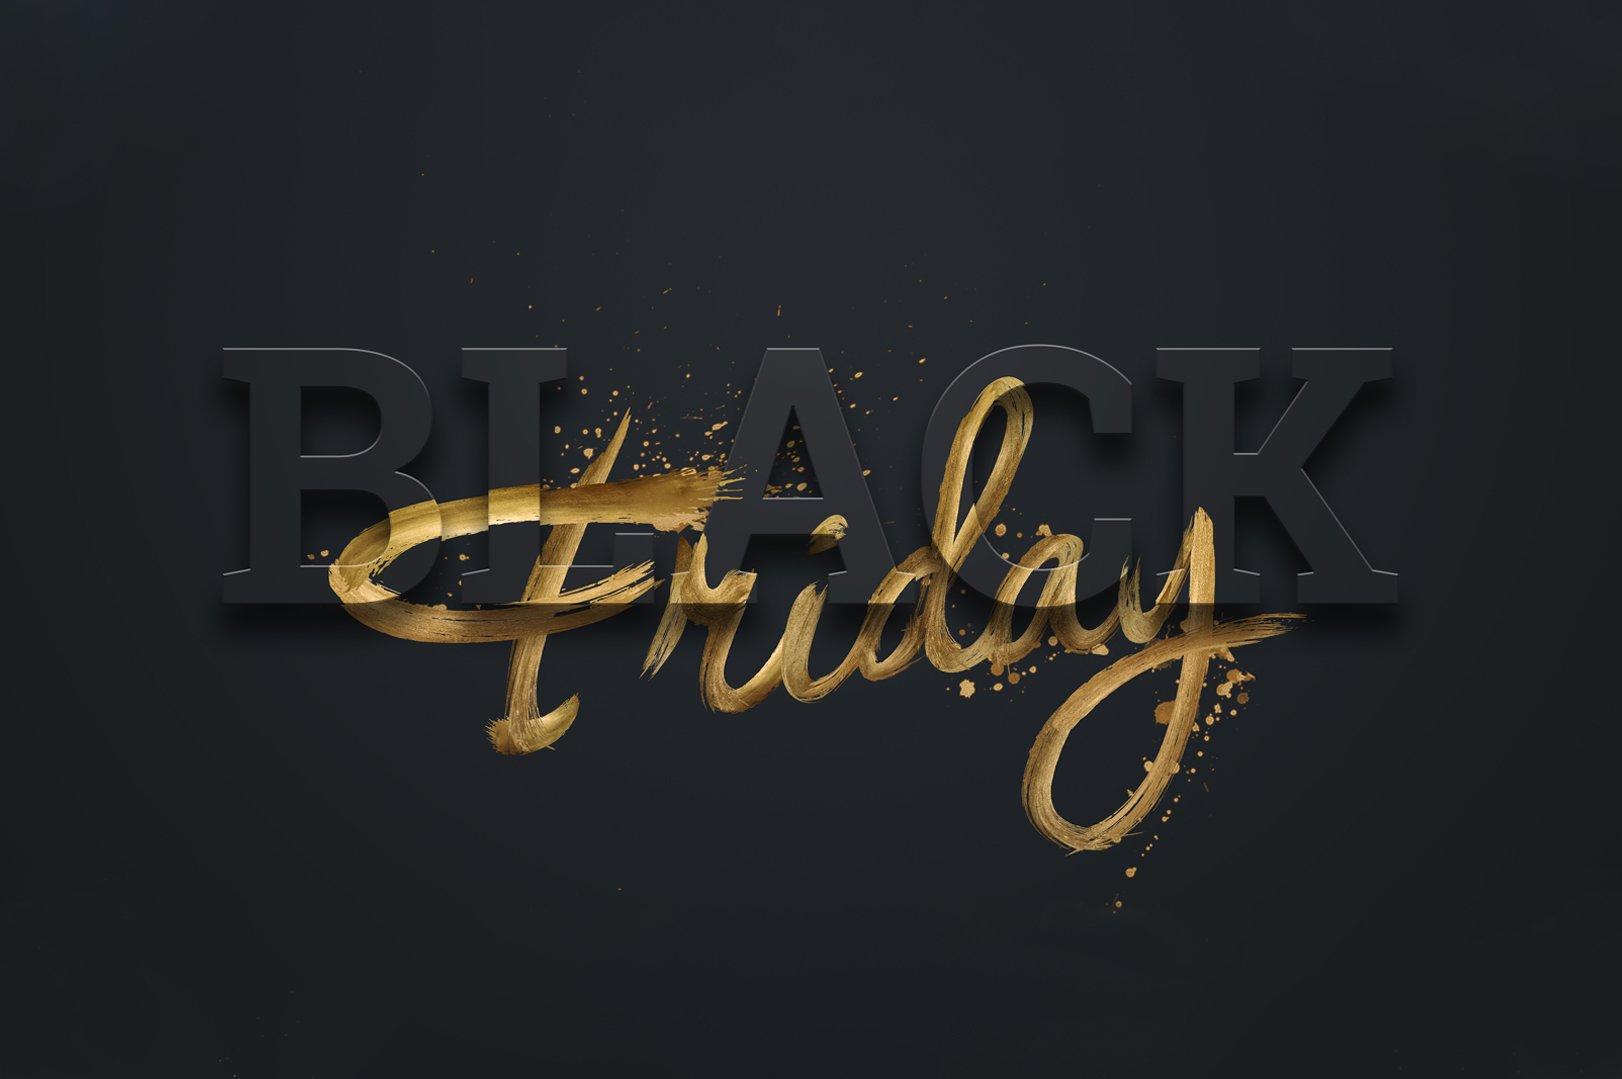 RoncaInforma - Storia del Black Friday, tra leggende e realtà